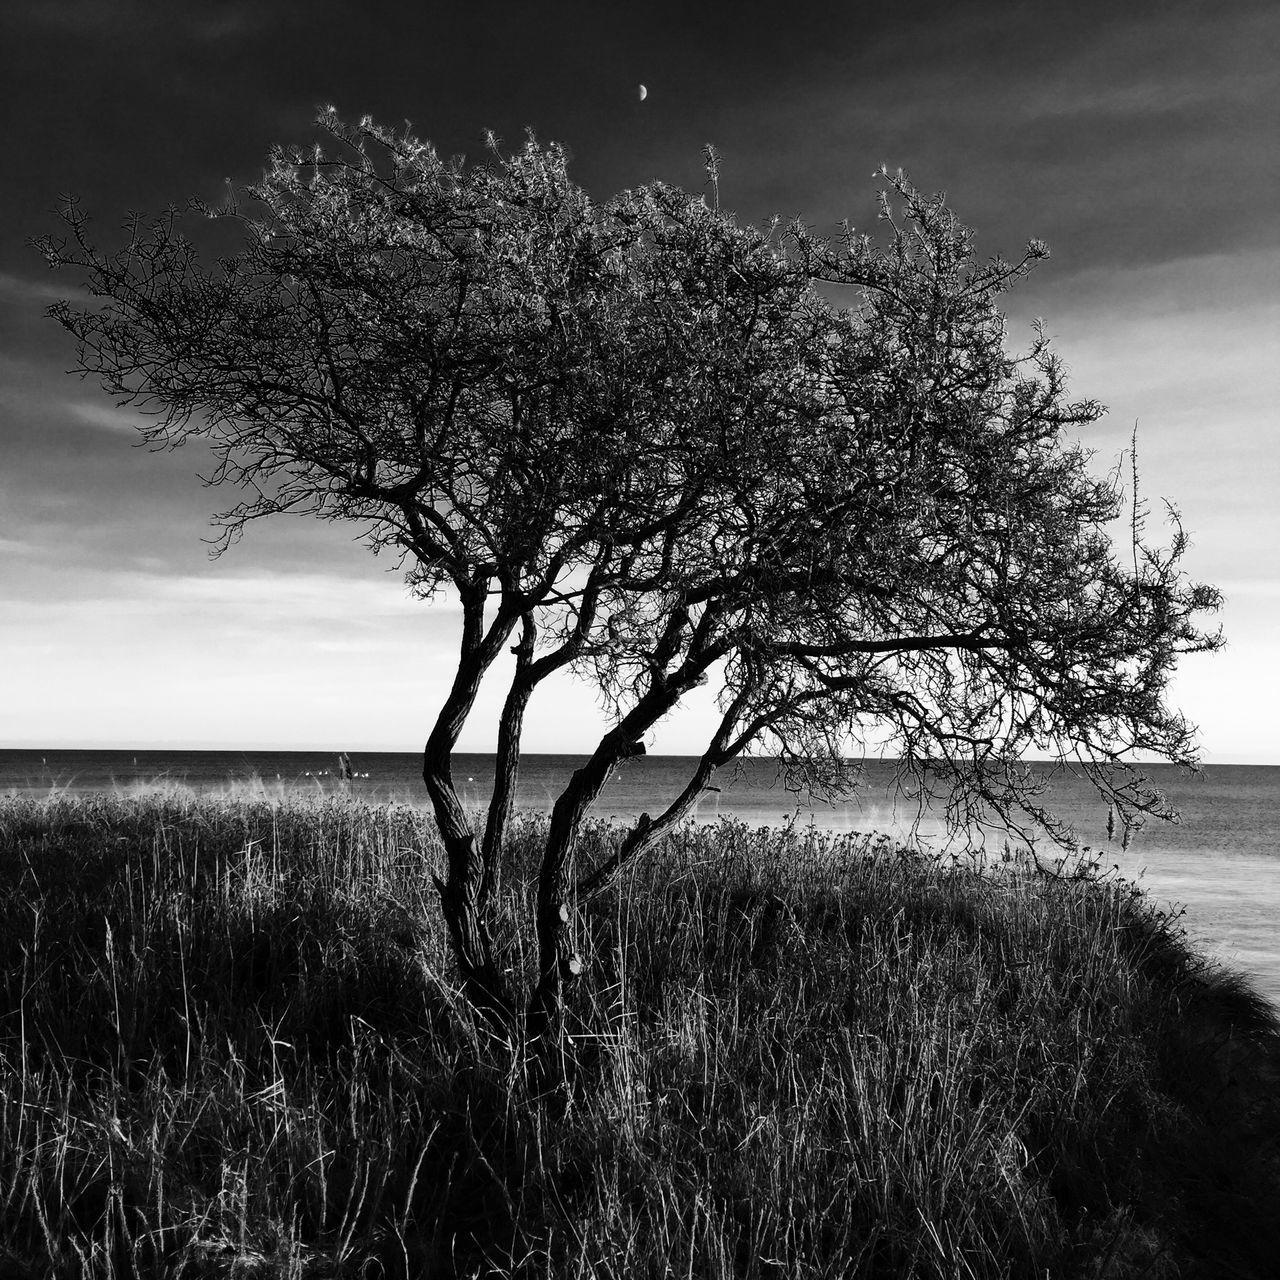 Tree Growing On Sea Shore Against Sky